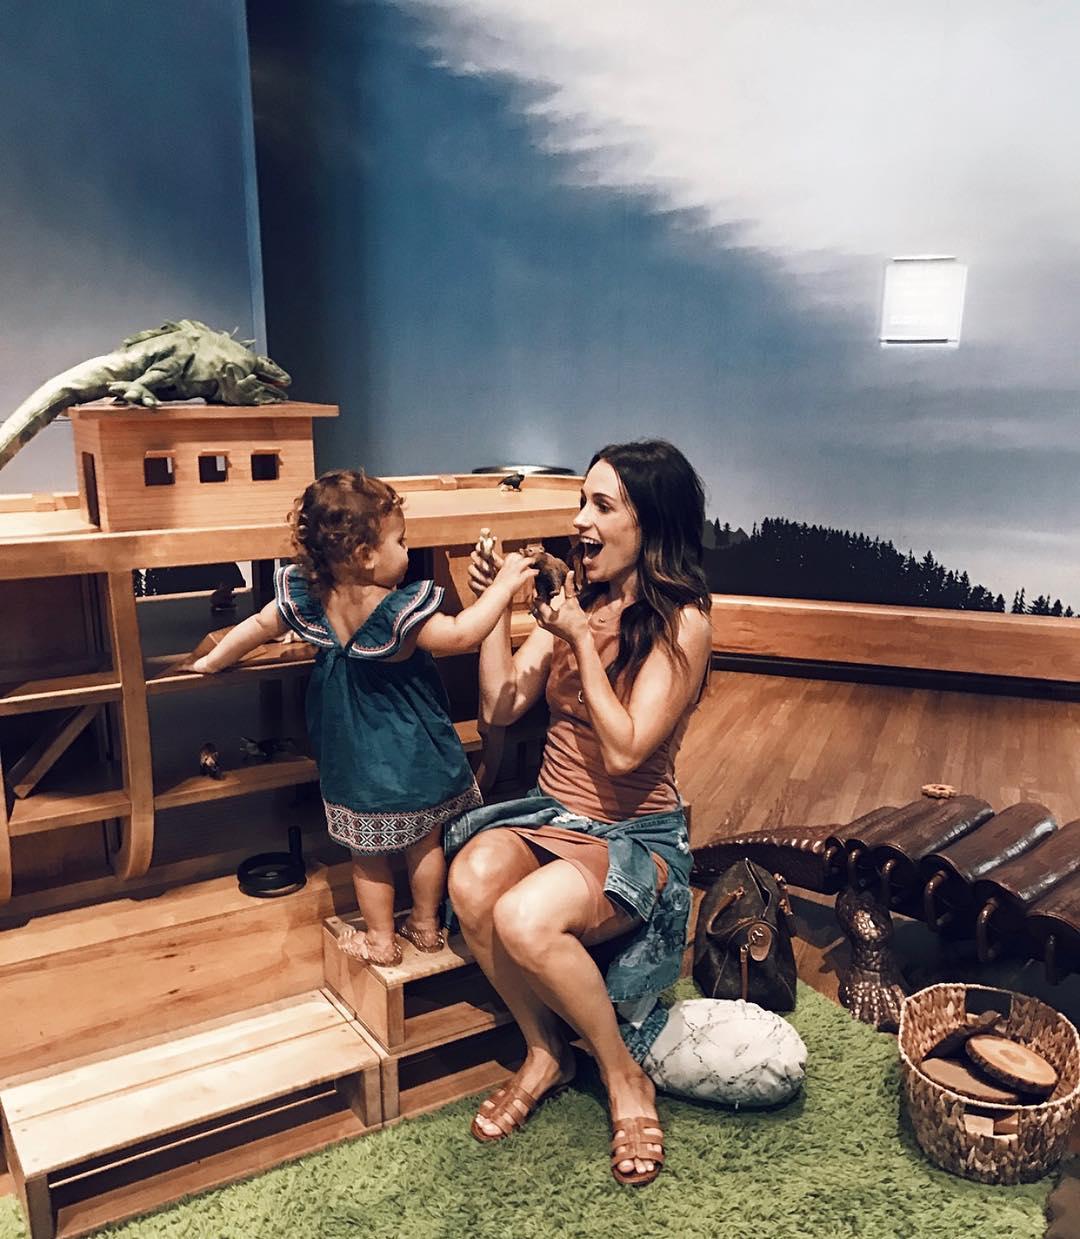 Noah's Ark: Skirball Cultural Center post by: @itsybitsyindulgences